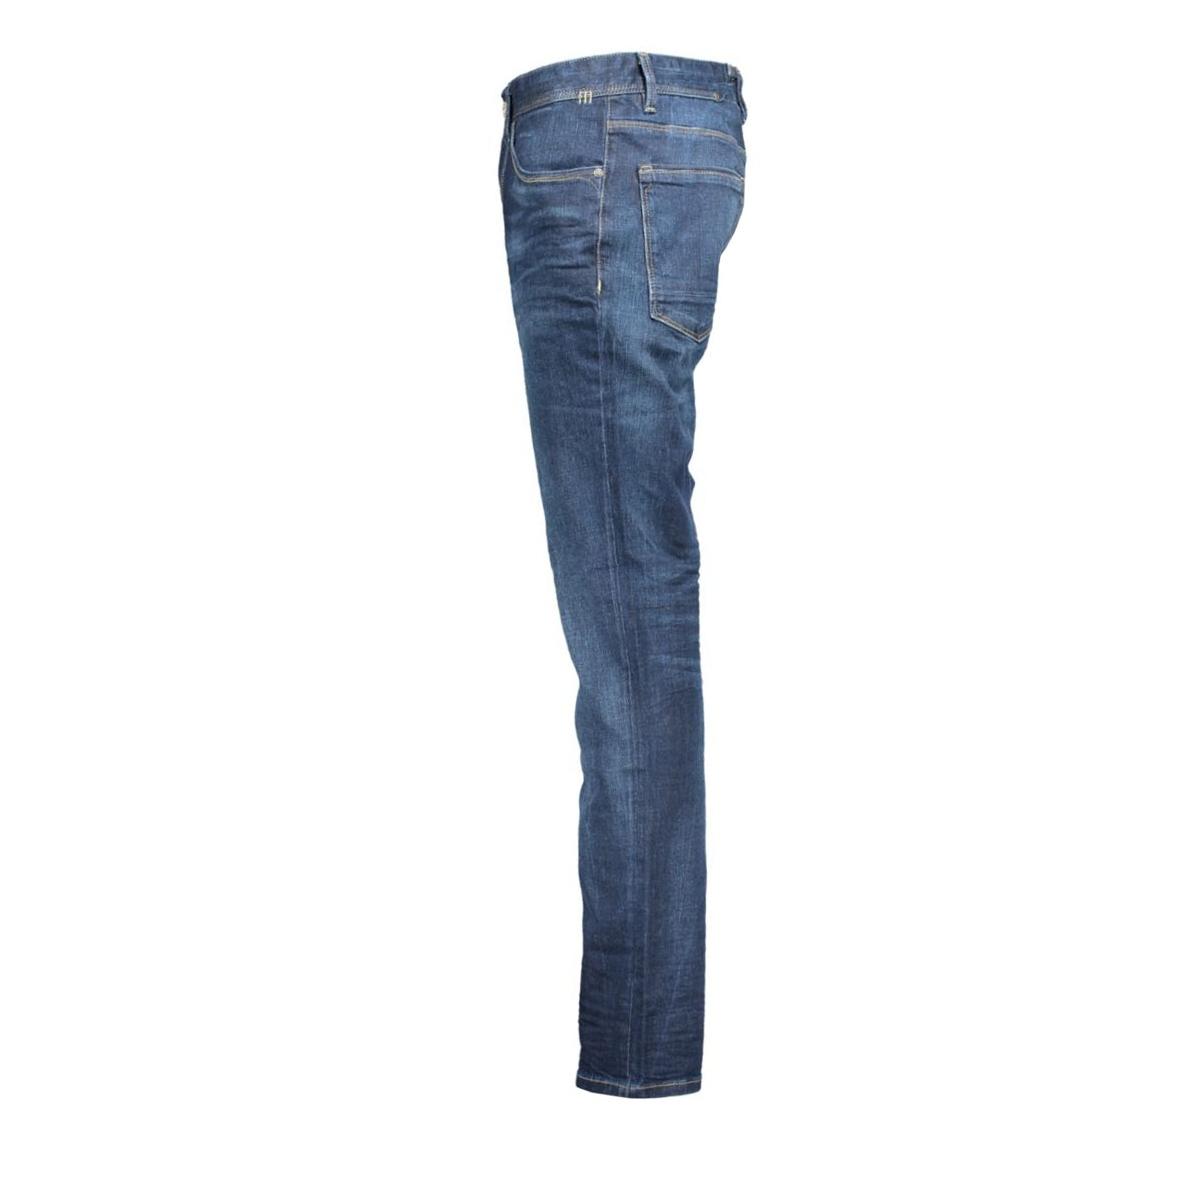 rider vtr515 v7 vanguard jeans pure blue comfort.